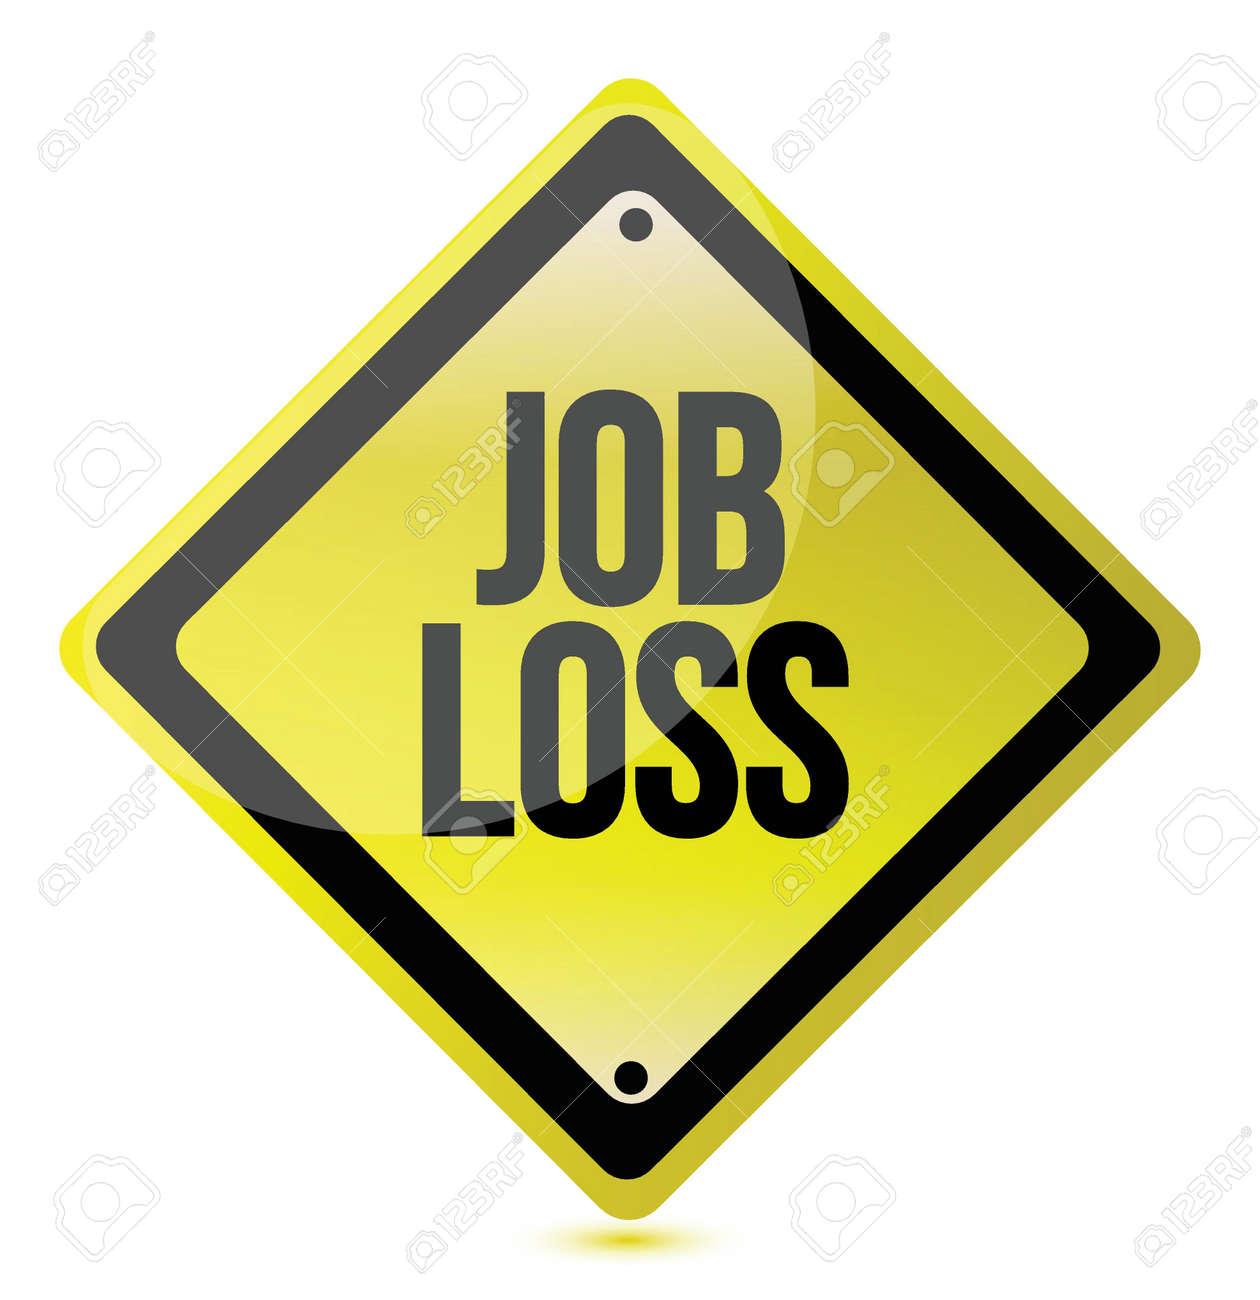 job loss sign illustration design over a white background Stock Vector - 16617328